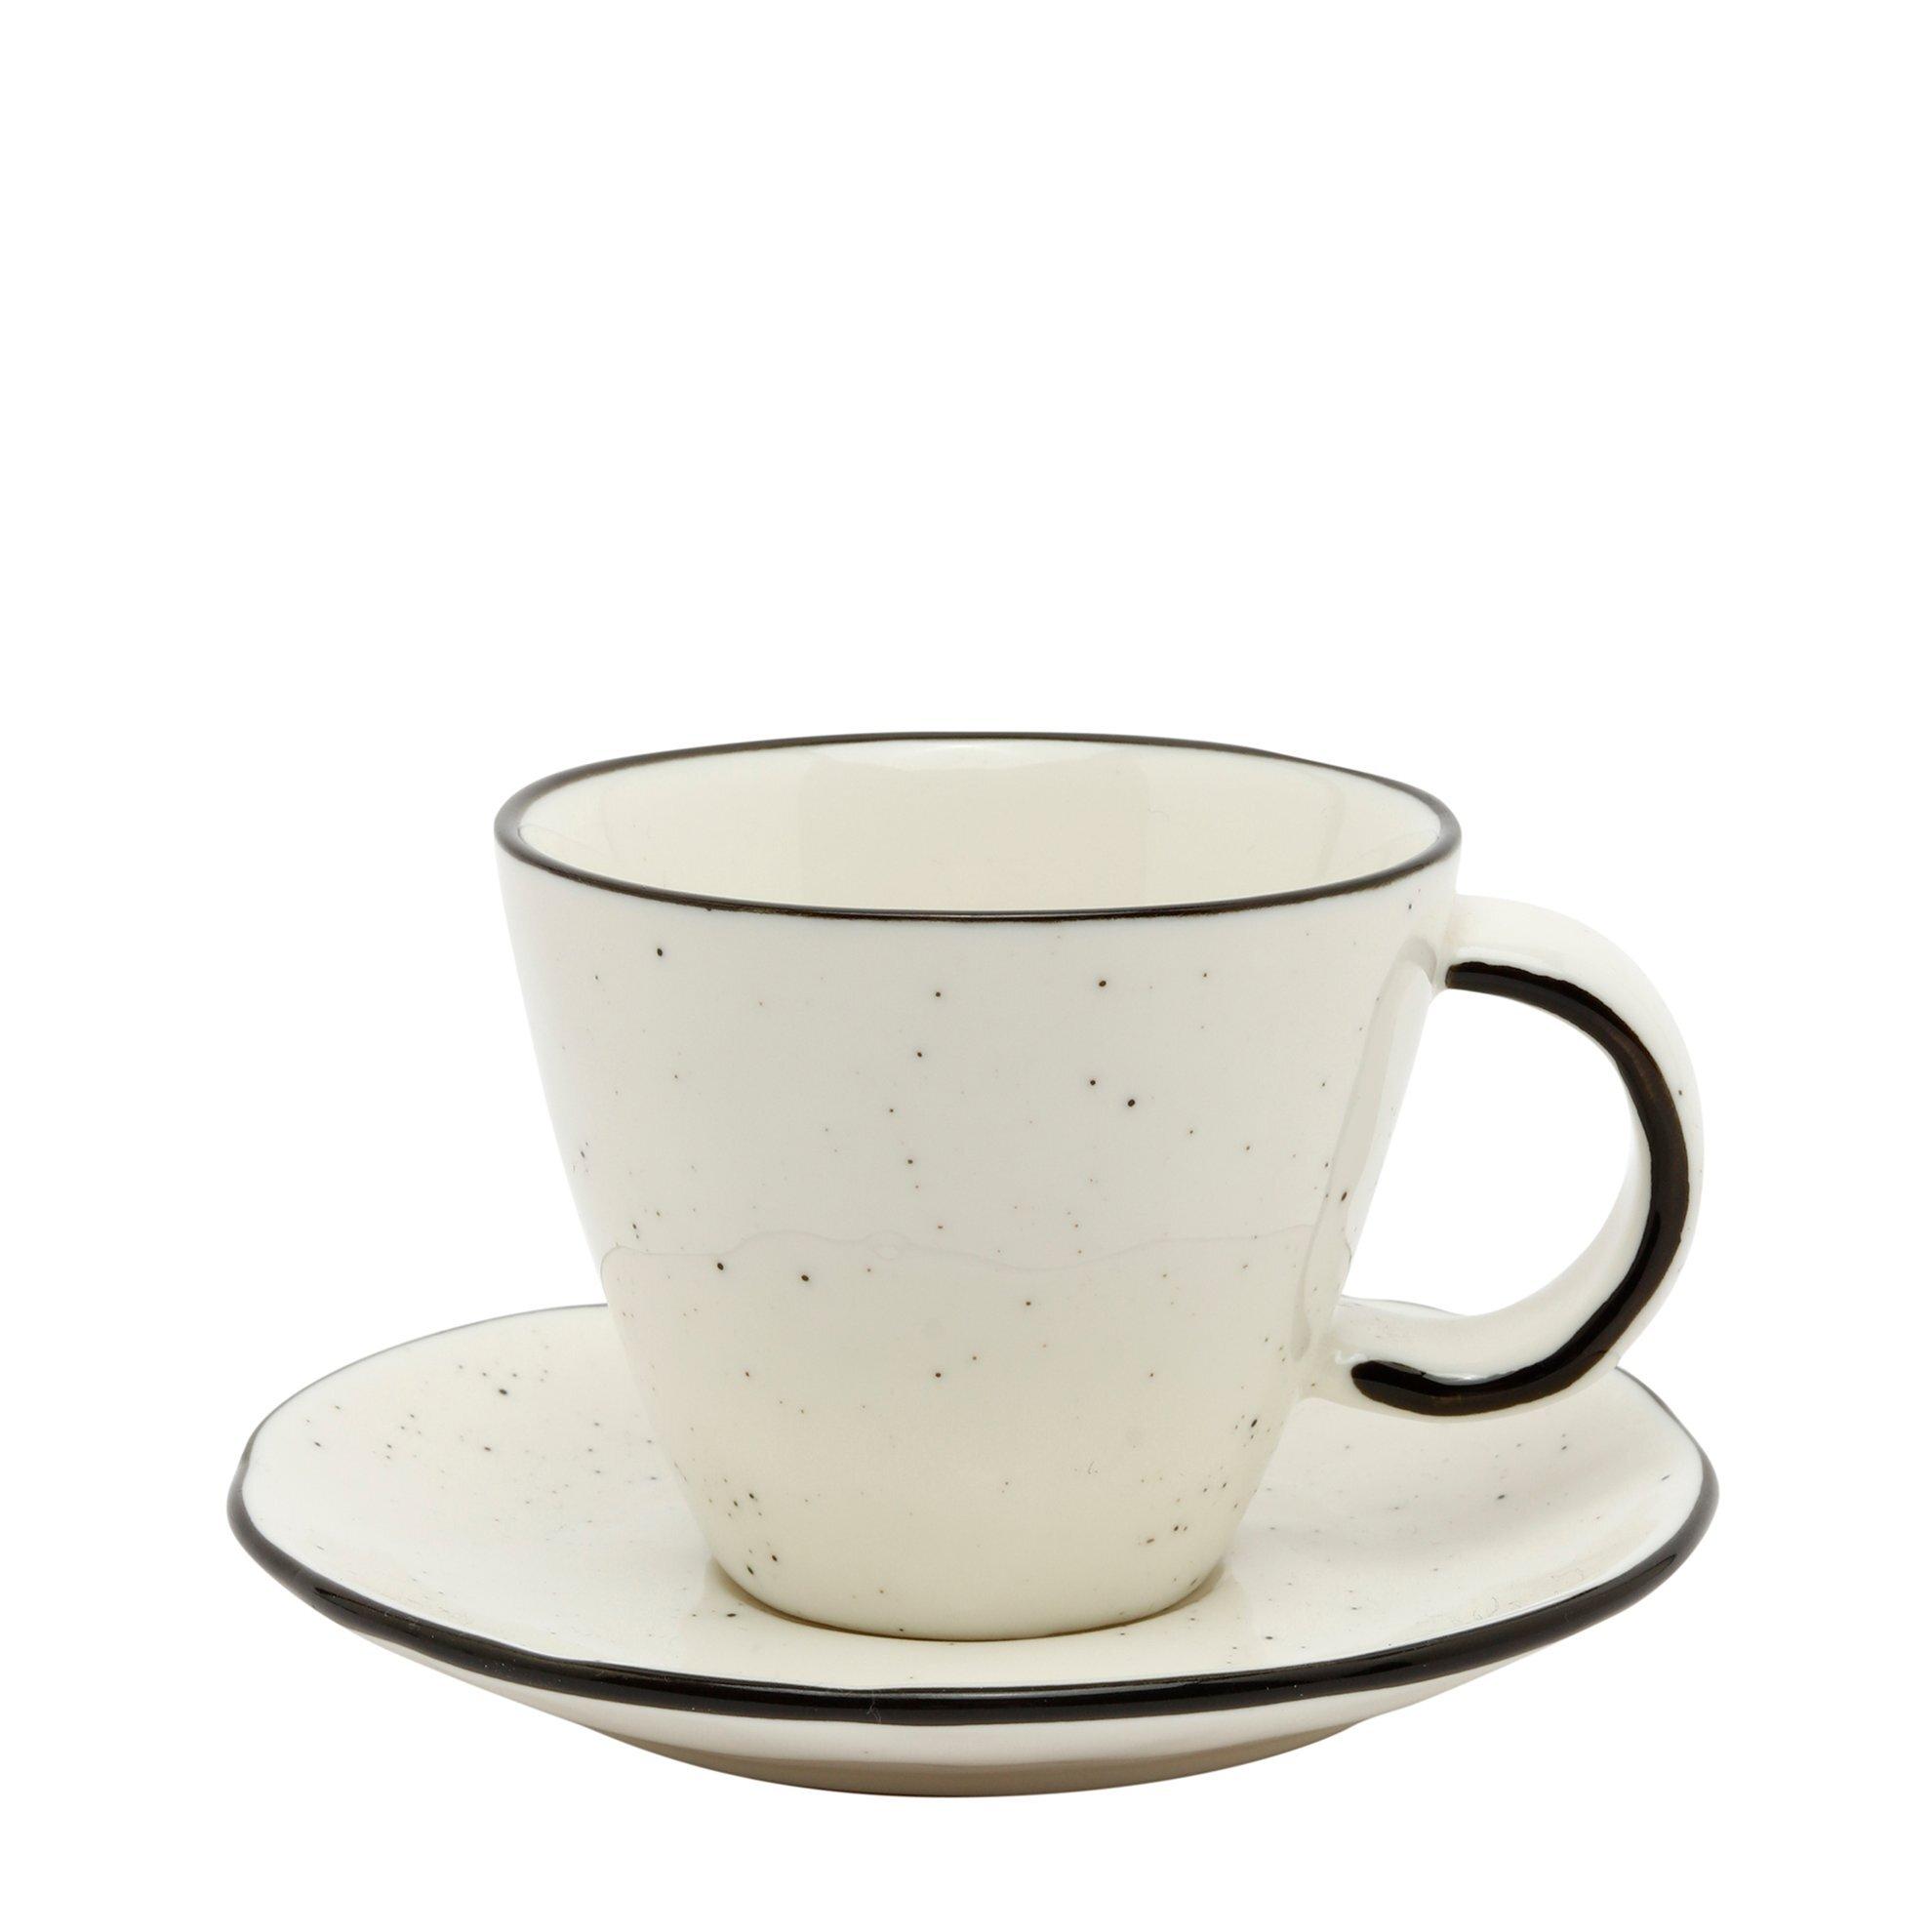 Porcelain Espresso Cup & Saucer